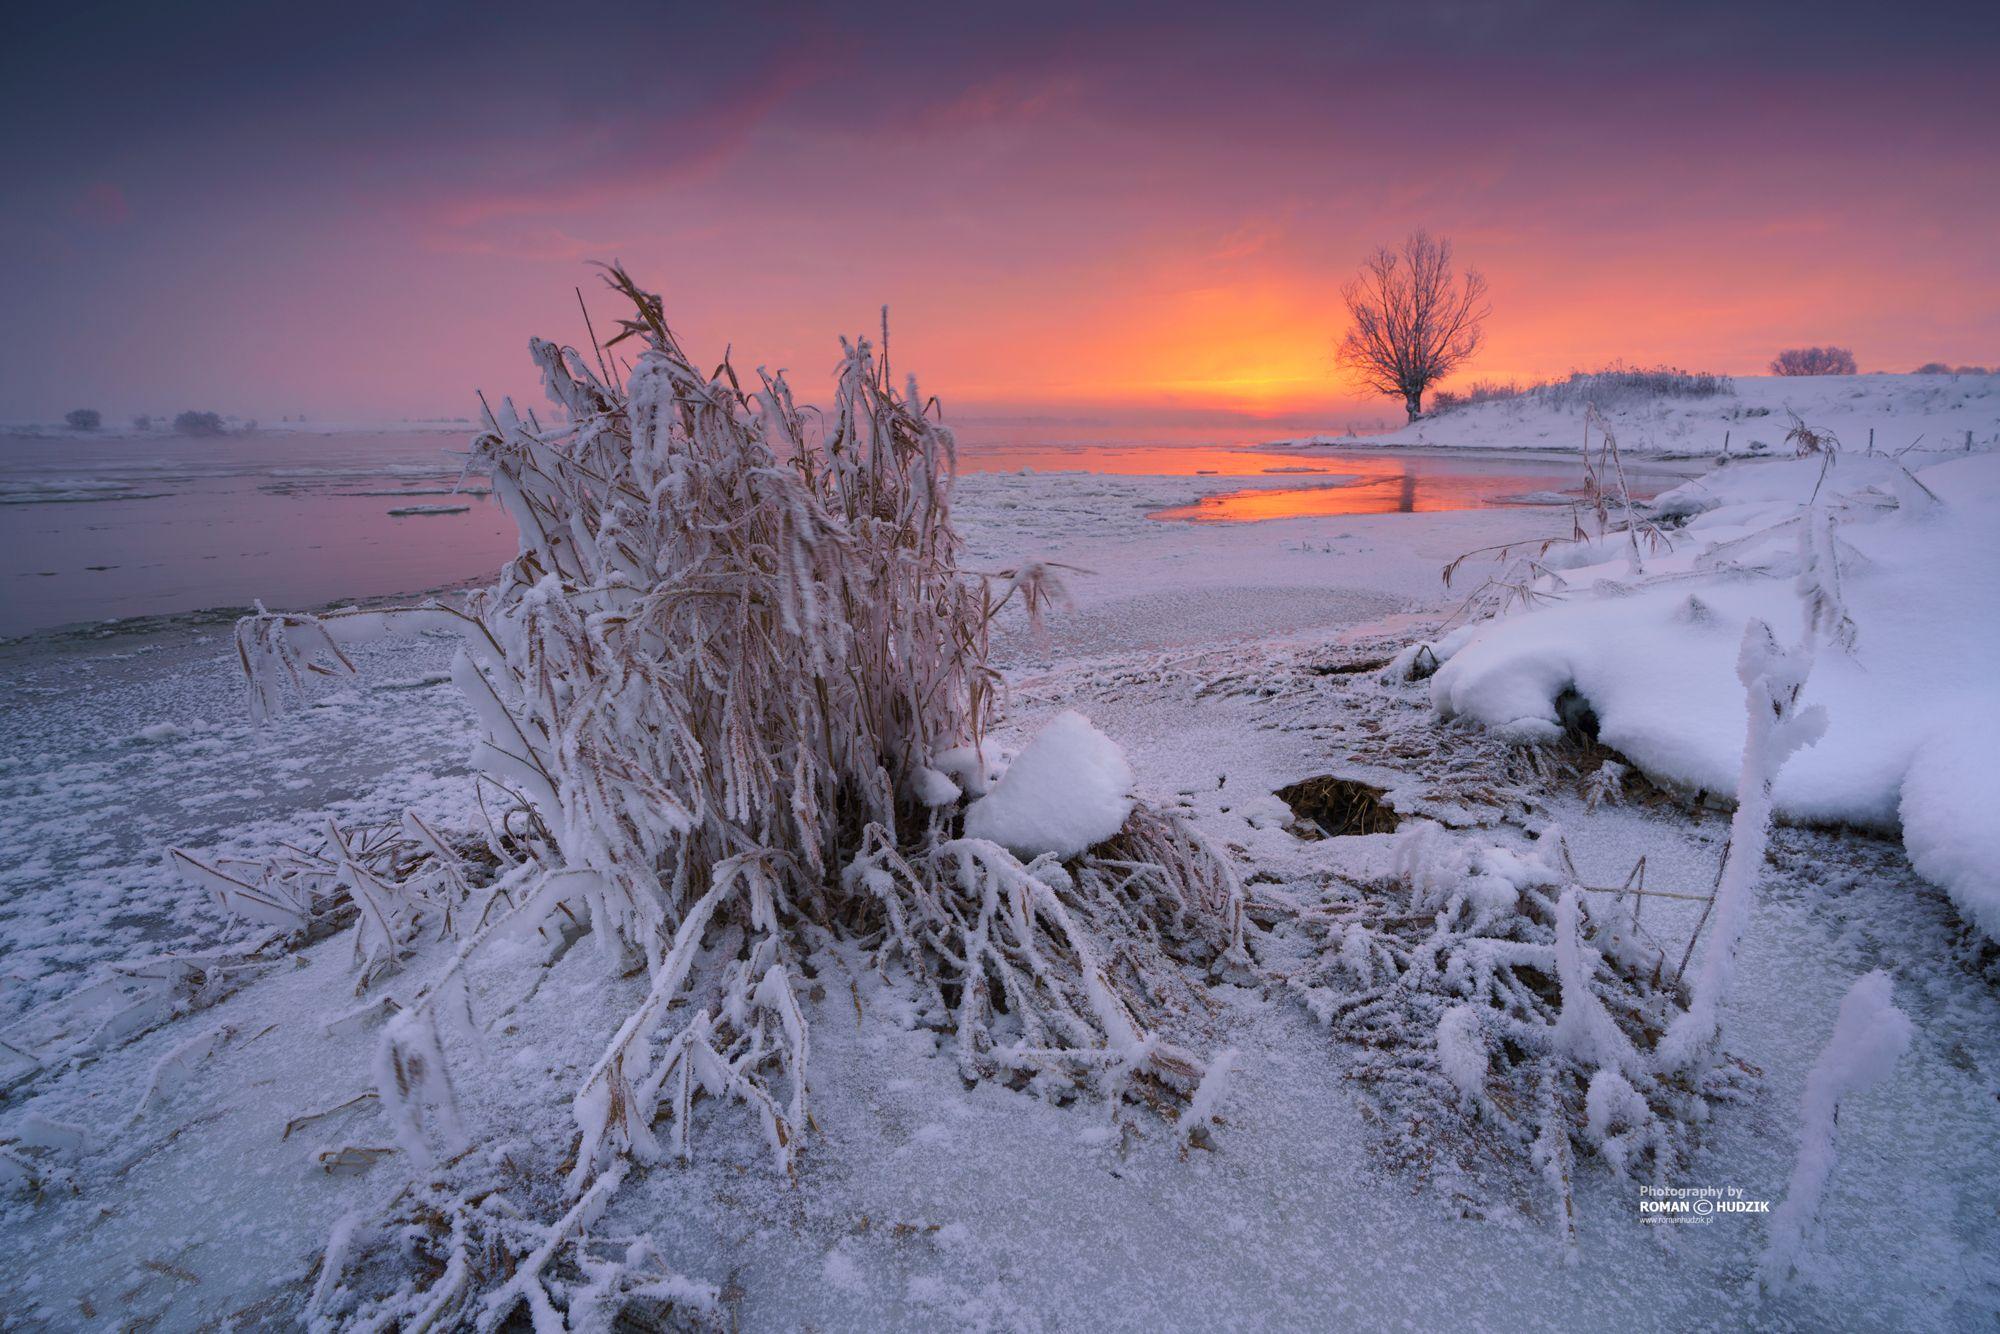 winter, landscape, river, snow, tree, ice, snow, sunrise, Poland, Kociewie, Hudzik Roman